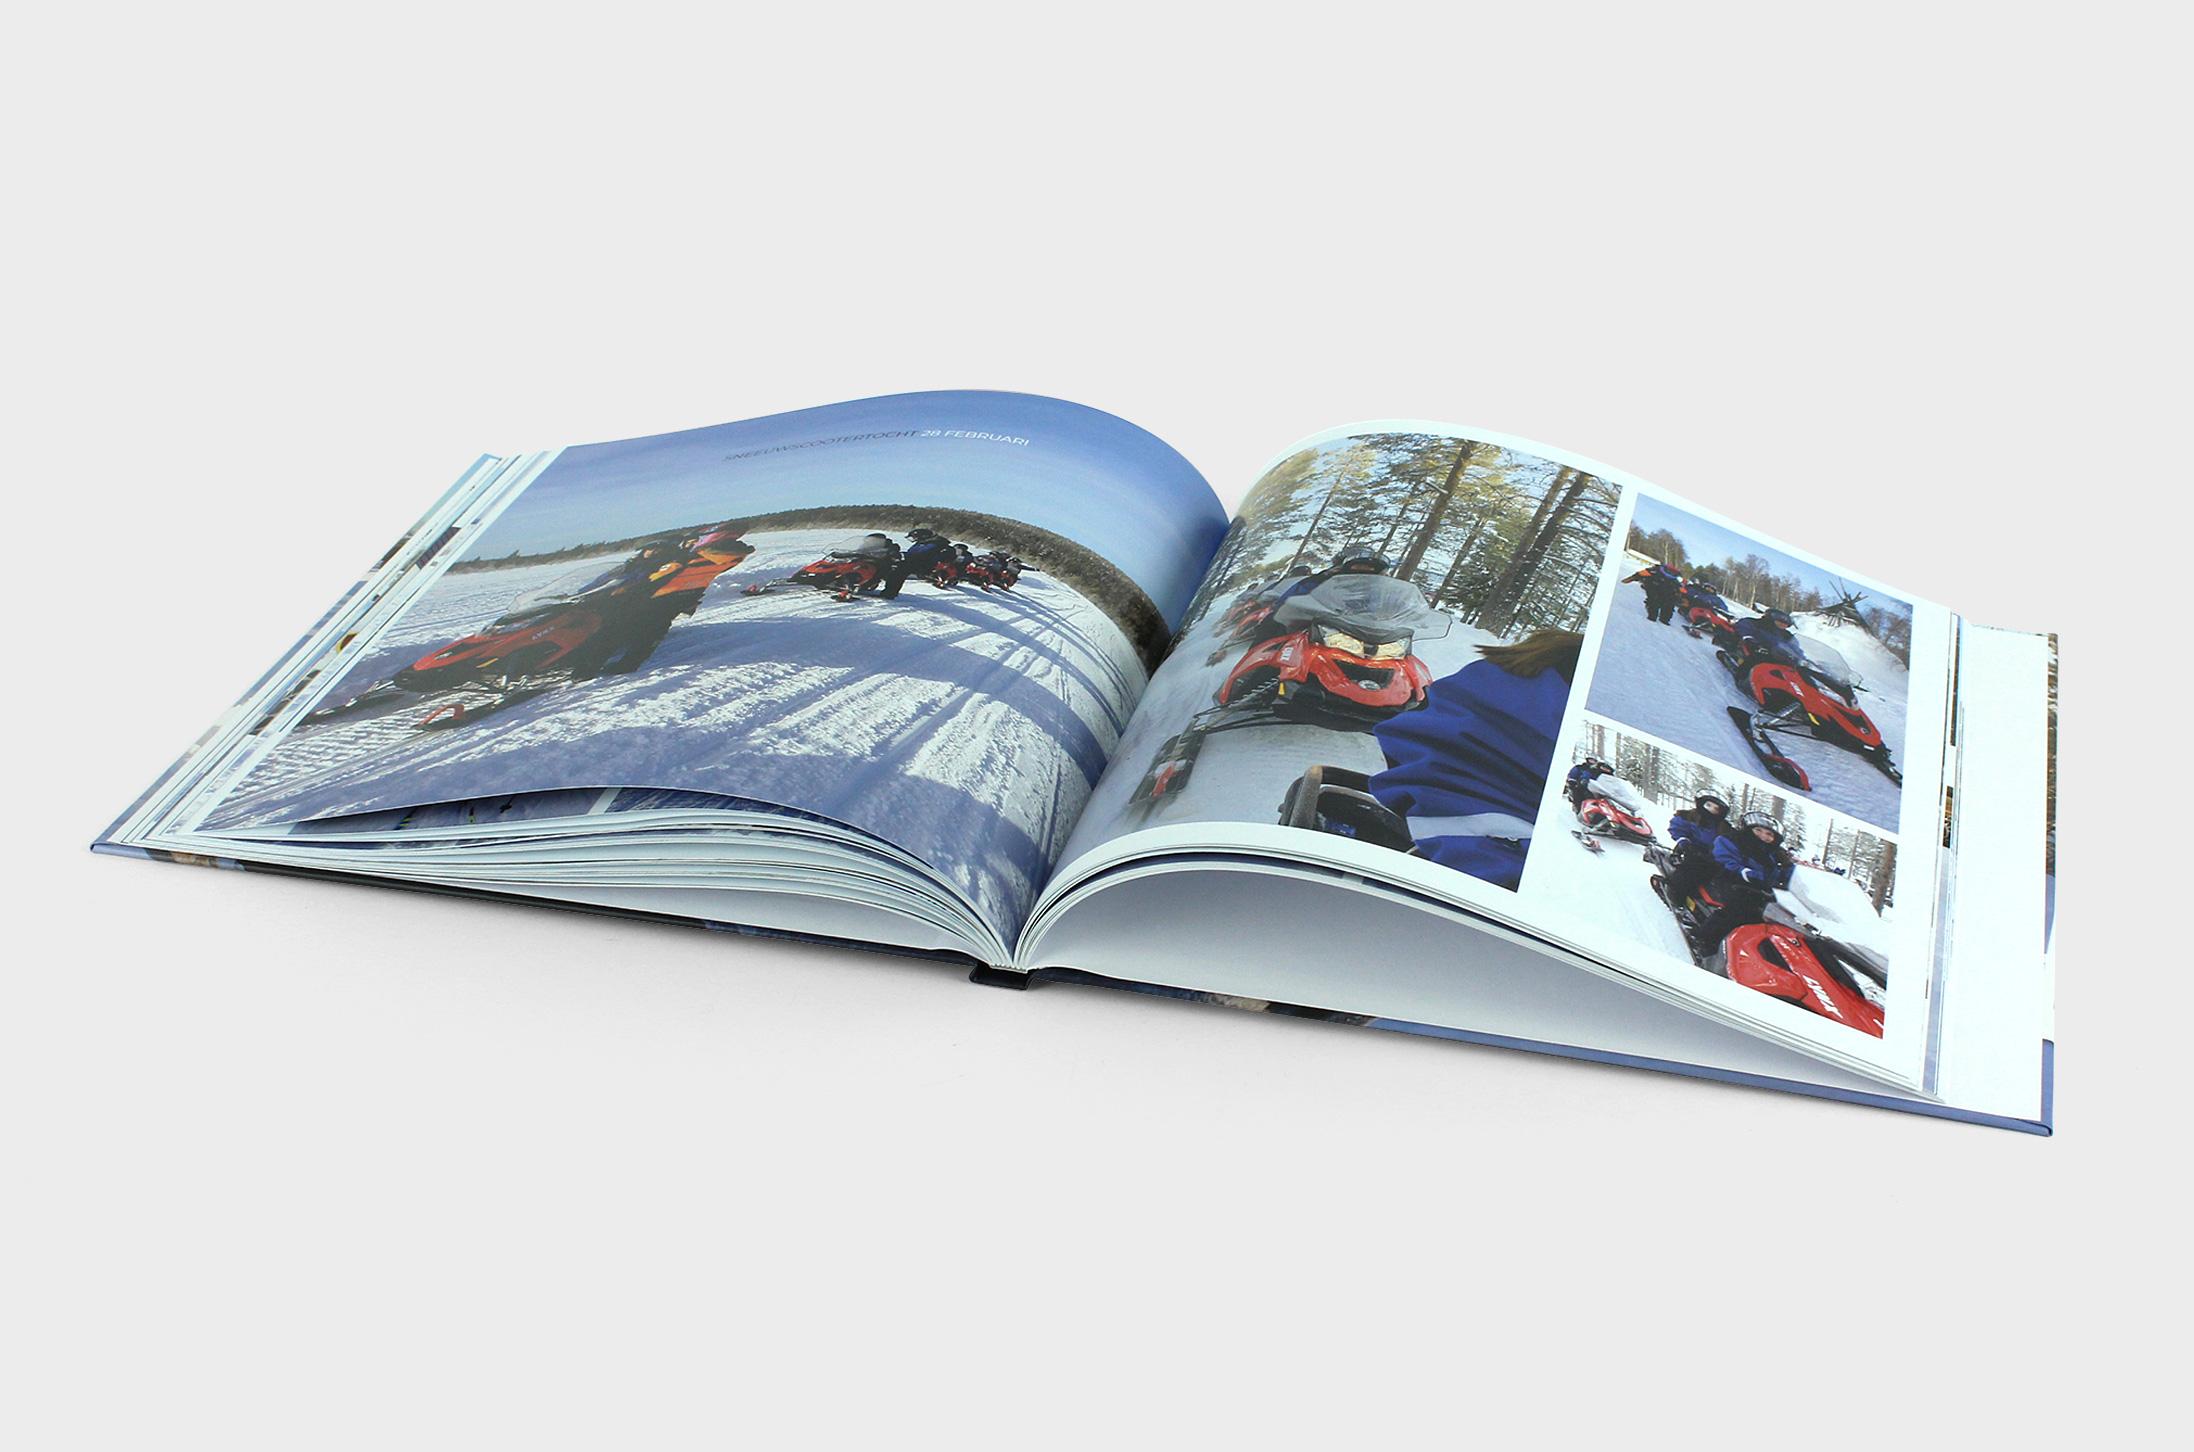 Fotoboek Fins Lapland – Levi